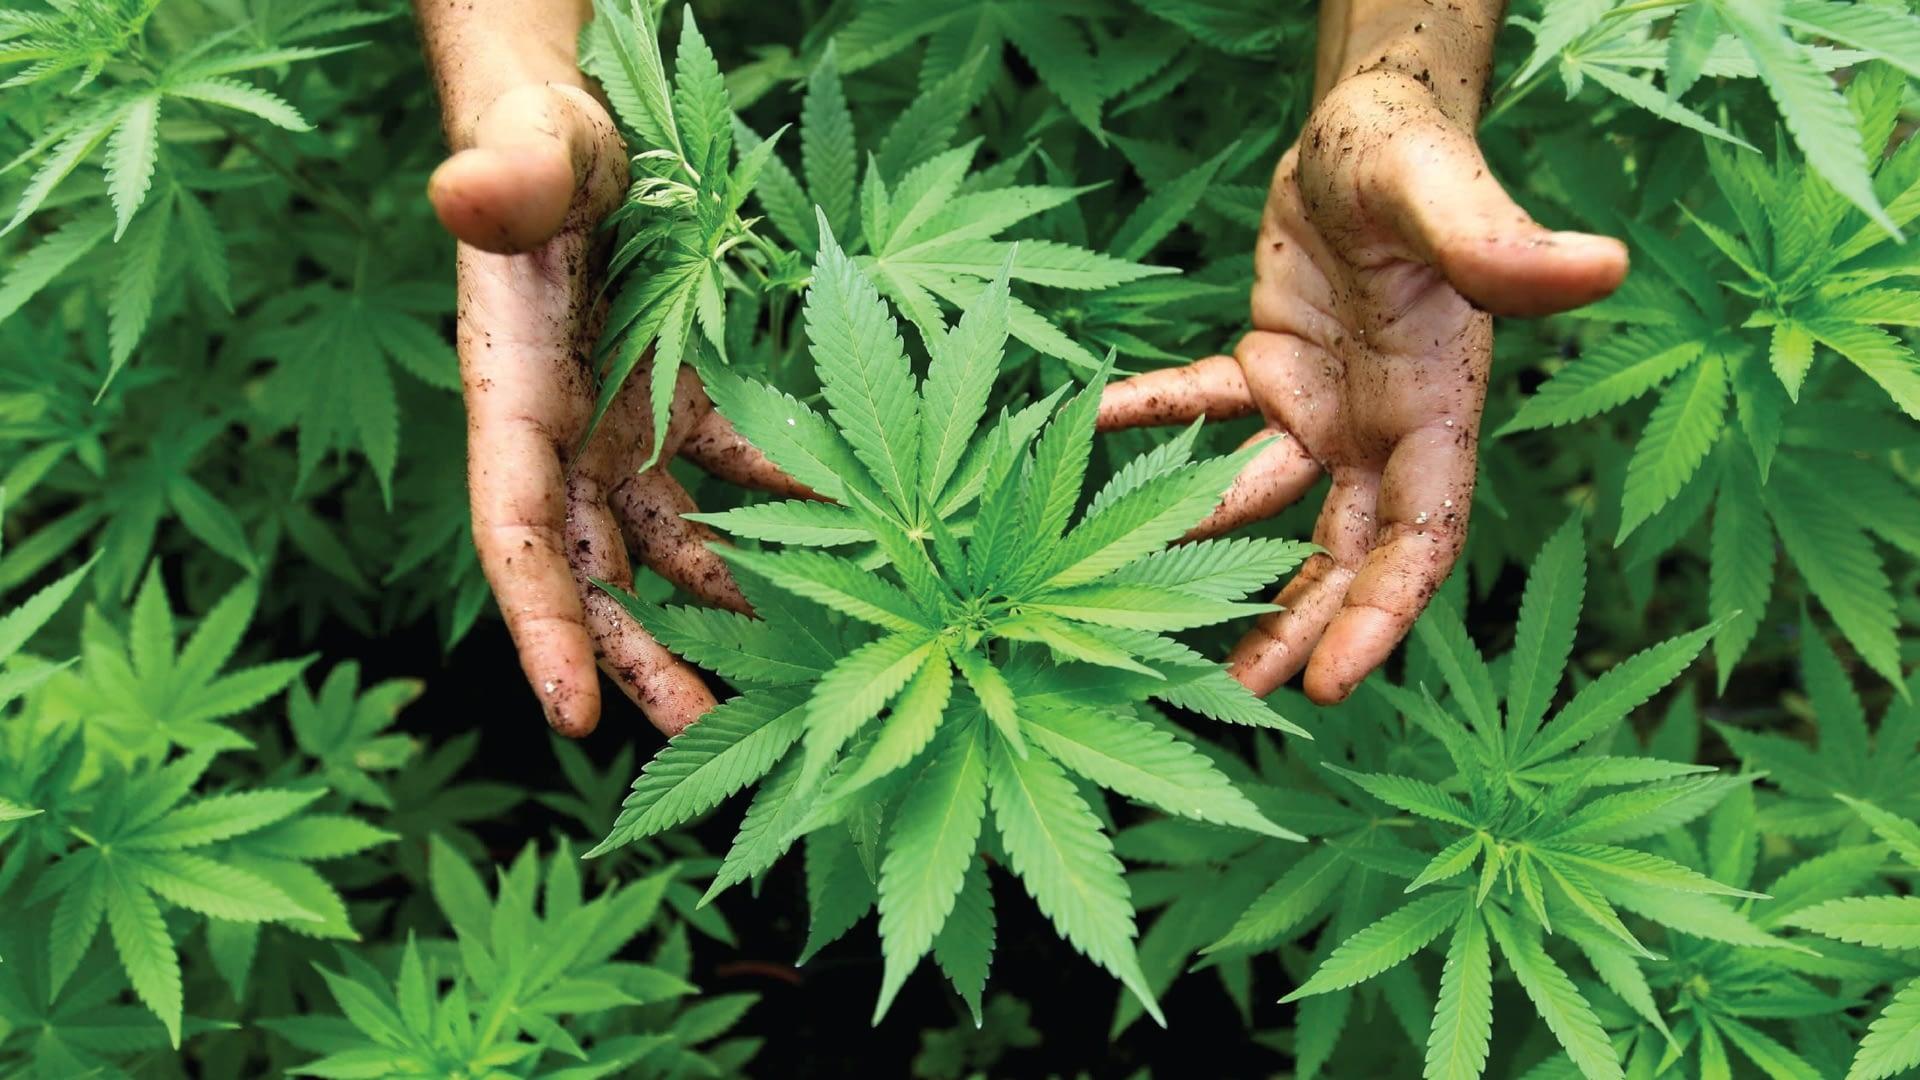 Mexico Legalizes Recreational Pot